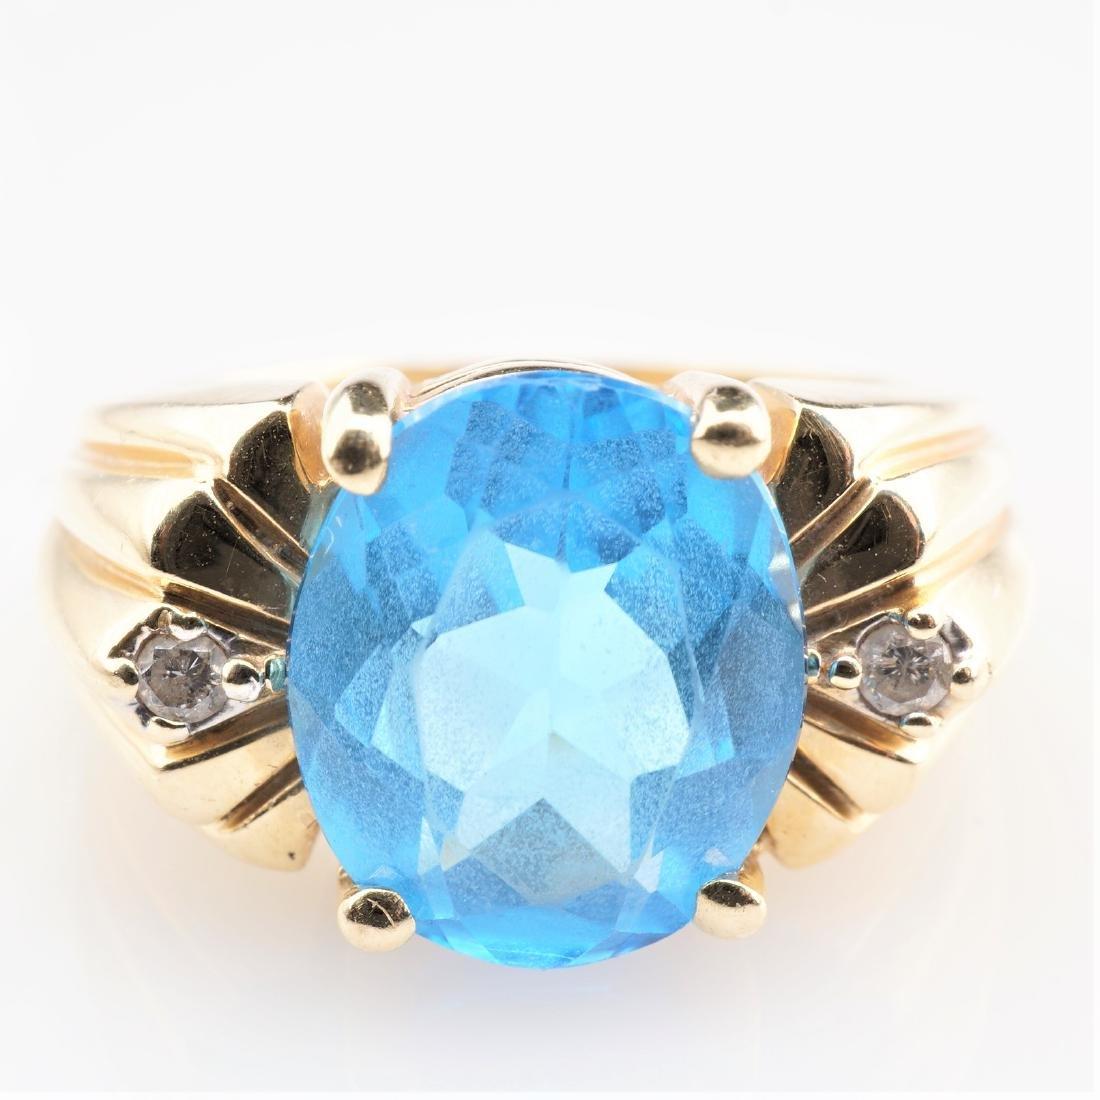 14K YG Topaz and Diamond Ring sz 7